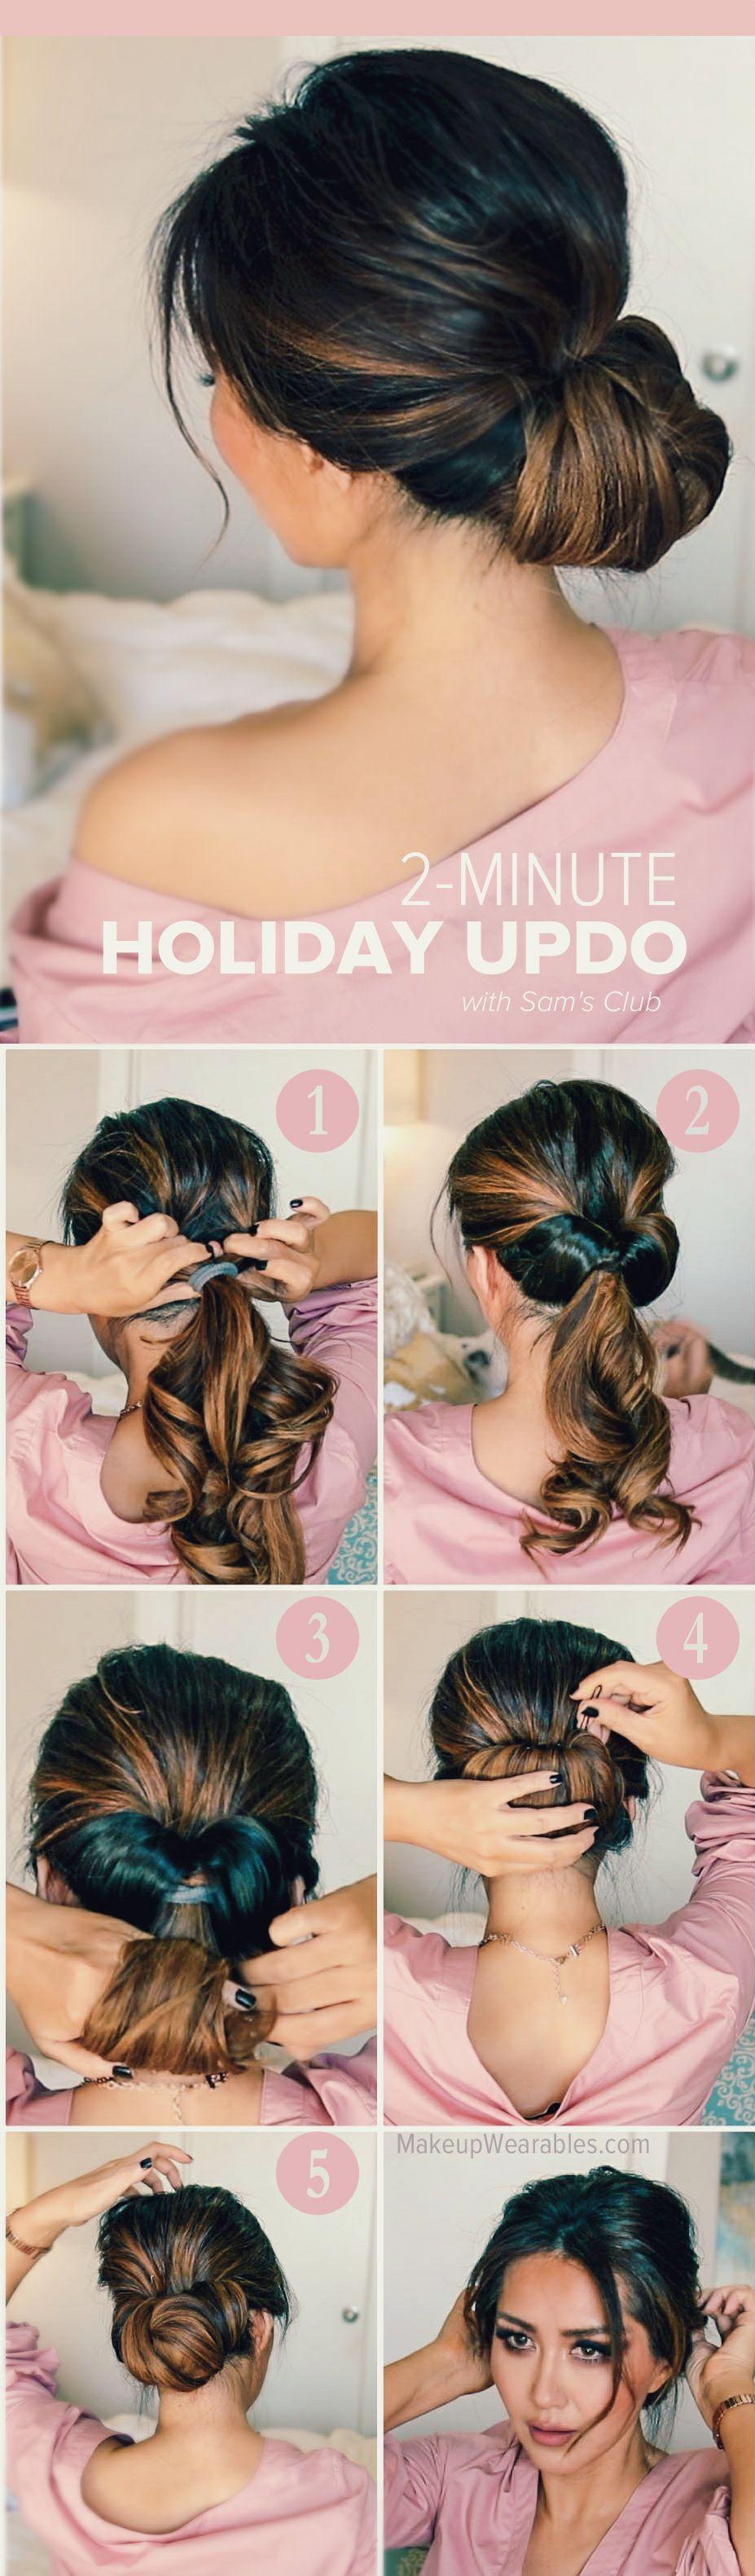 Pin by karen rumsey on hair pinterest hair styles hair and easy